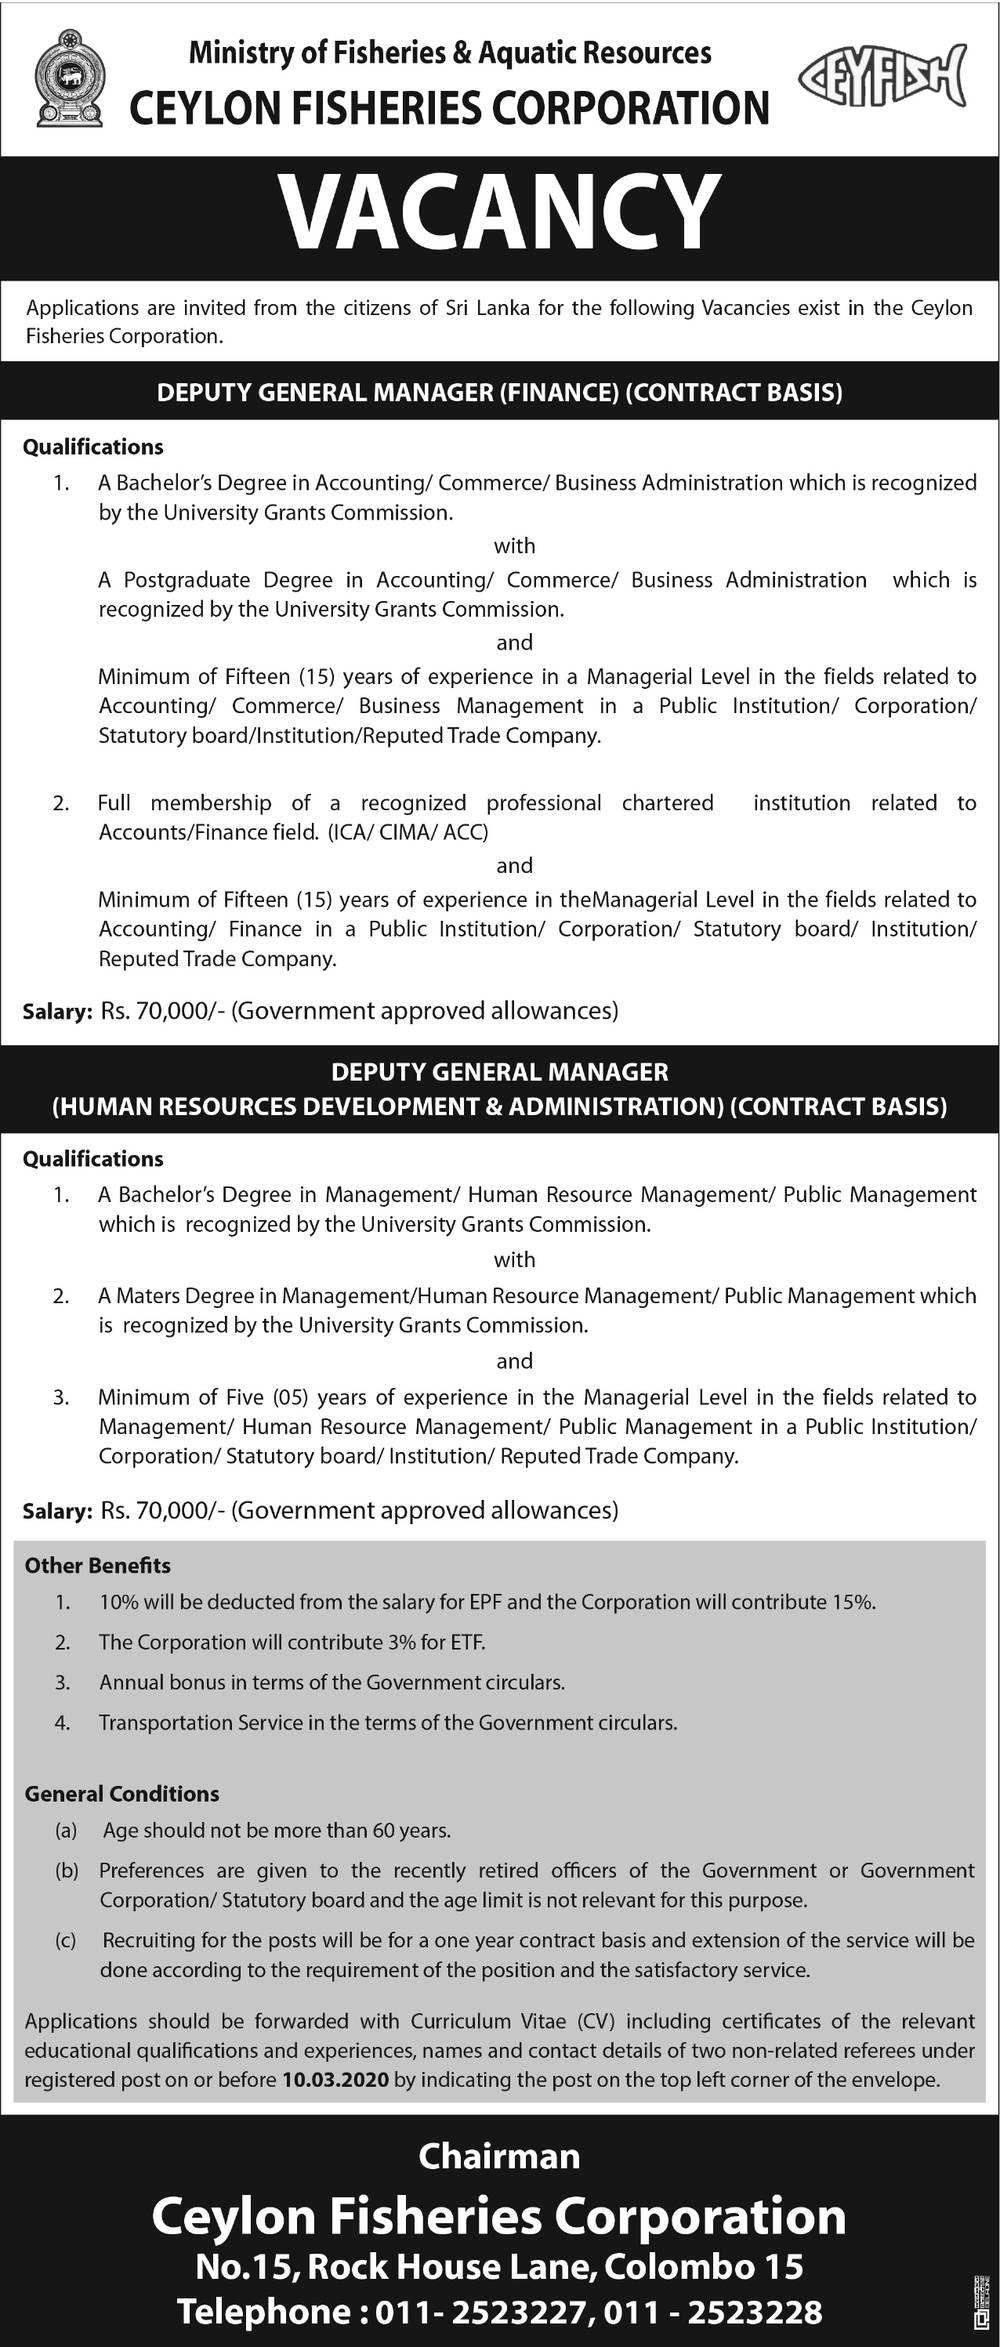 Deputy General Manager (Finance, HR Development & Administration) - Ceylon Fisheries Corporation